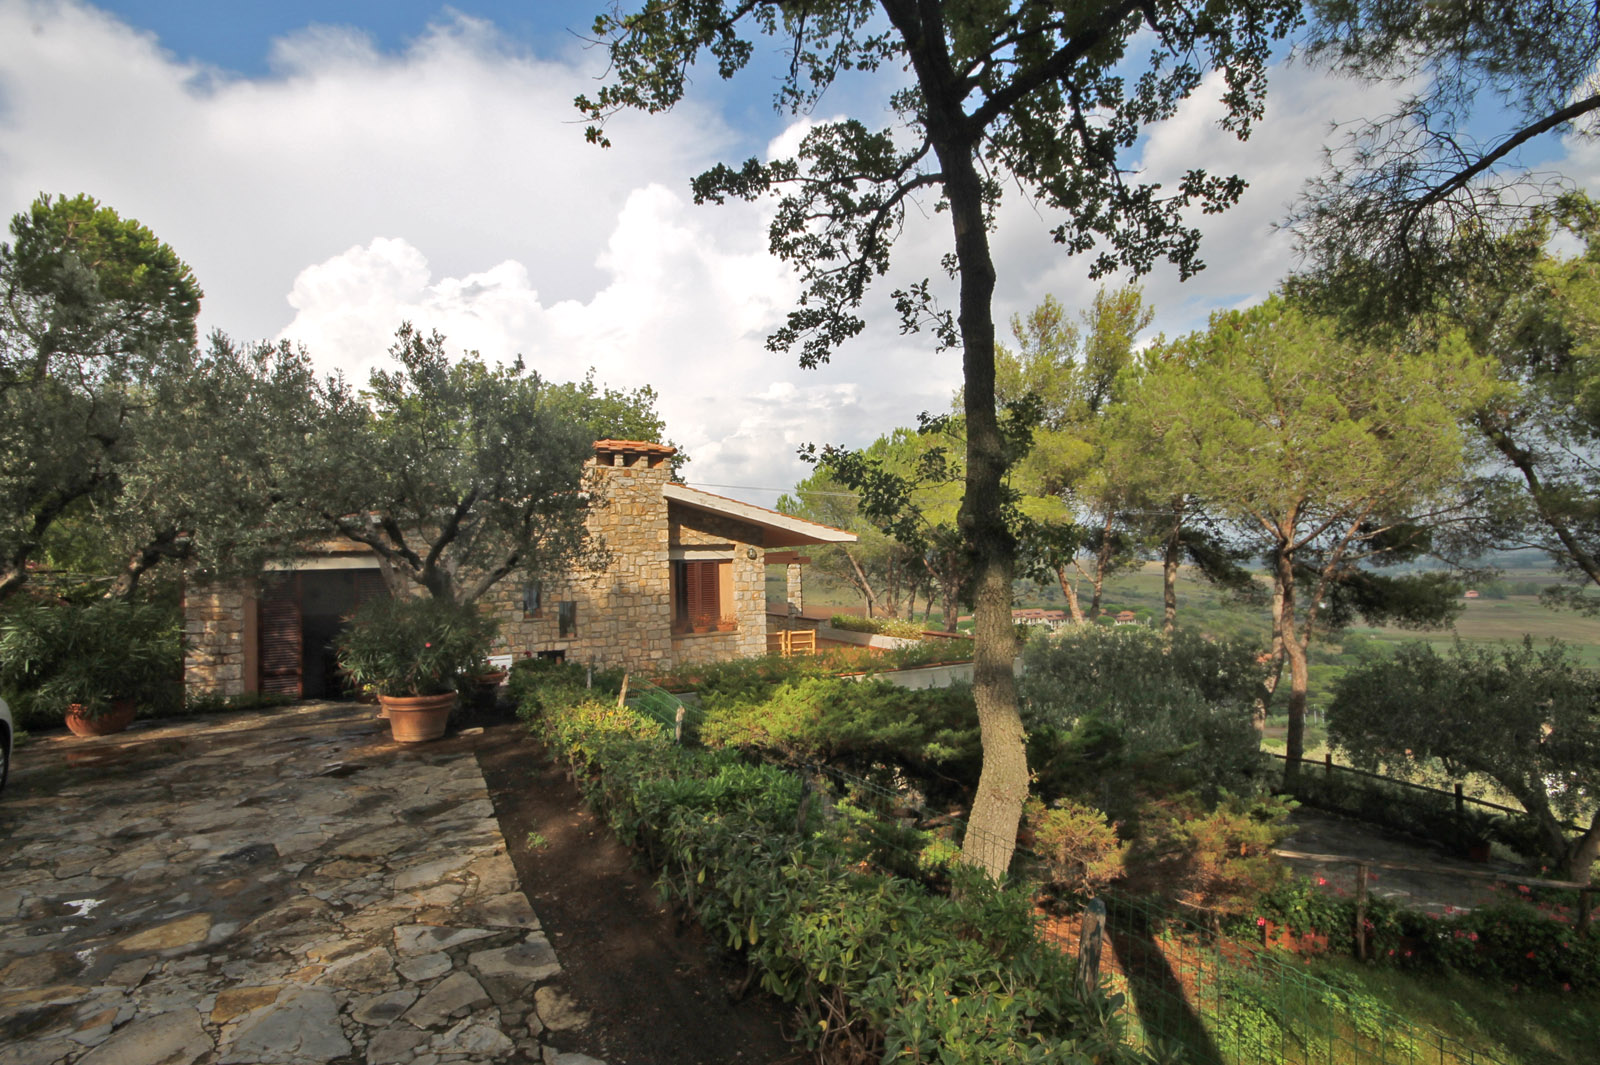 Toscana villa al mare in vendita house and houses italia for Toscana house